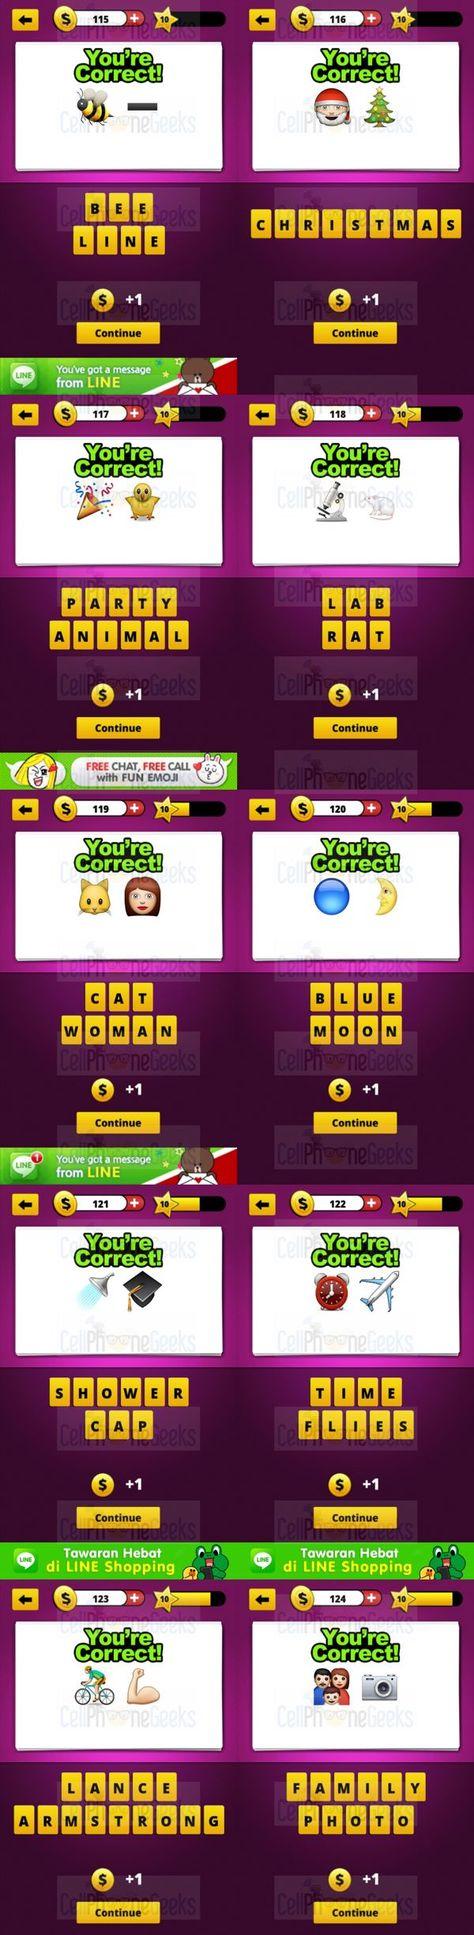 Guess The Emoji Level 10 Answers Guess The Emoji Answers Guess The Emoji Emoji Answers